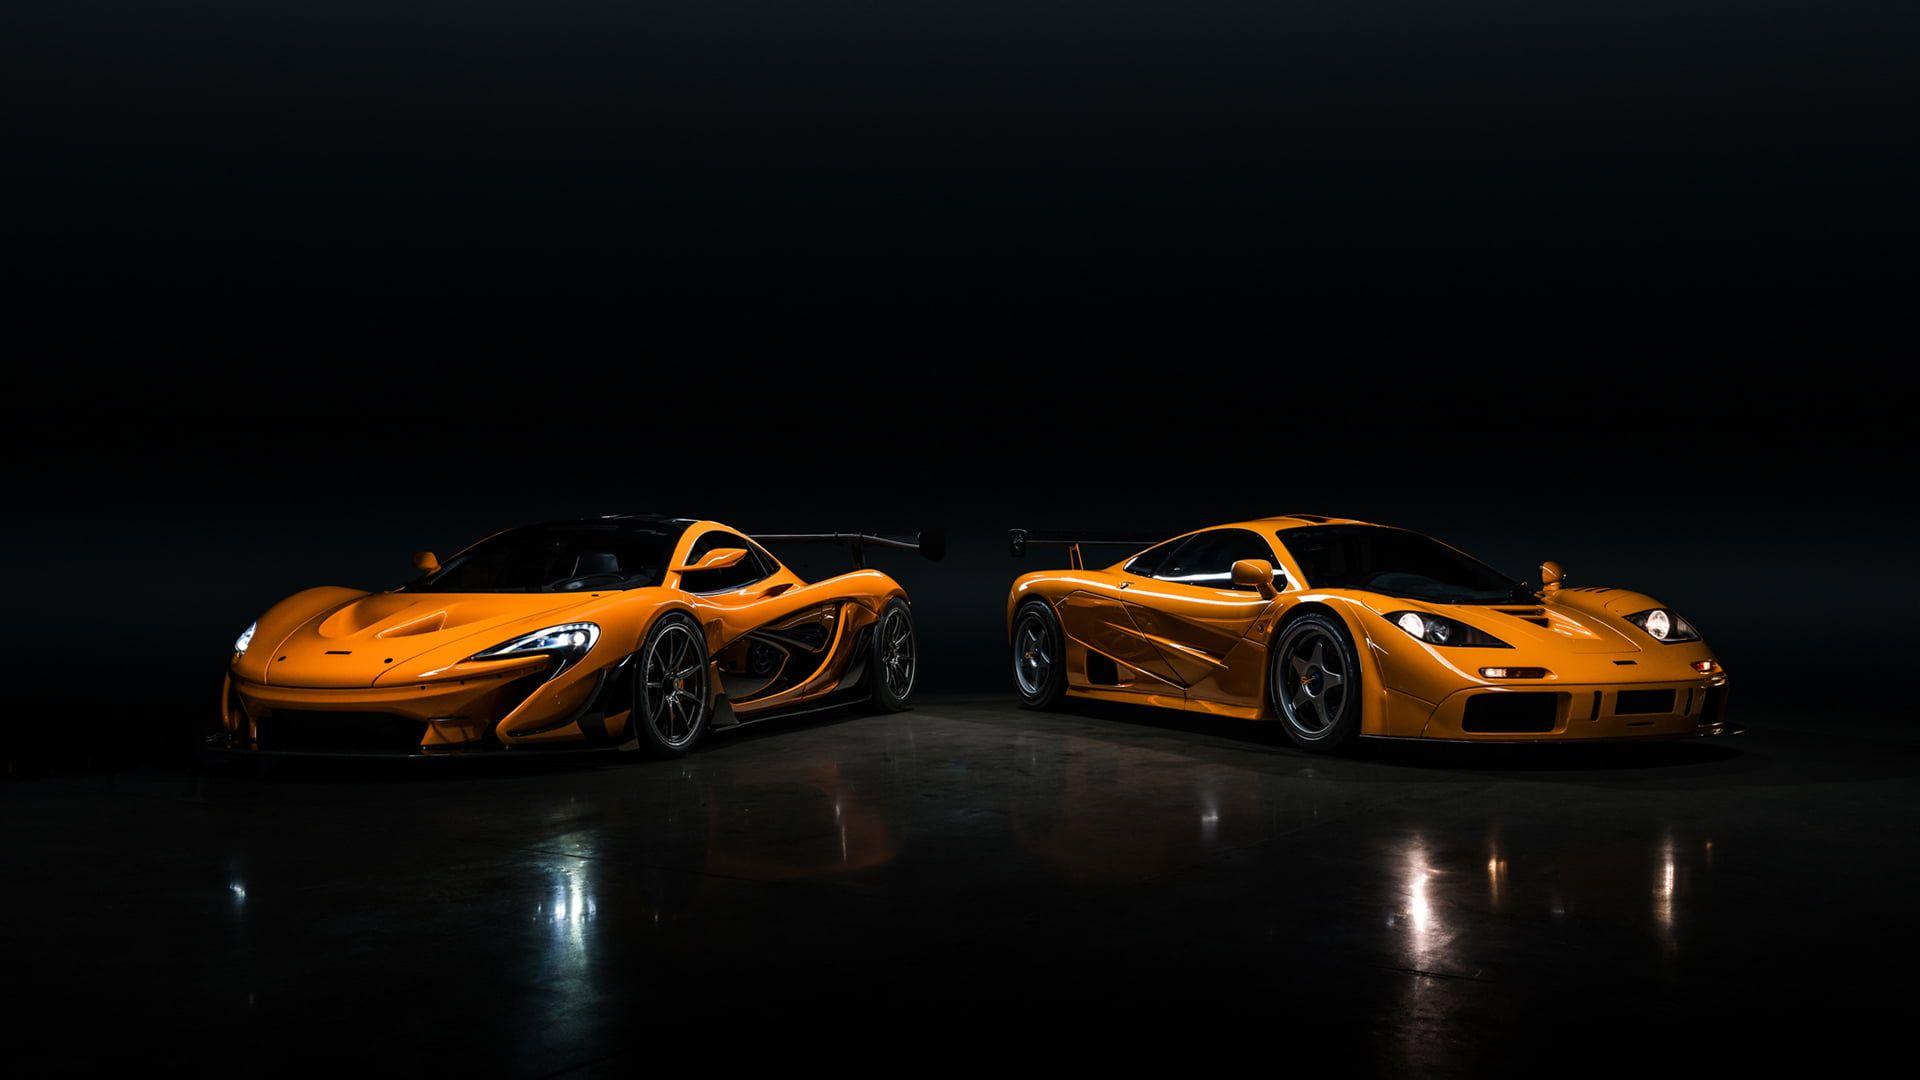 Mclaren Mclaren P1 Lm Mclaren F1 Lm Orange Cars Supercars Headlights 1080p Wallpaper Hdwallpaper Desktop Mclaren F1 Lm Mclaren F1 P1 Lm